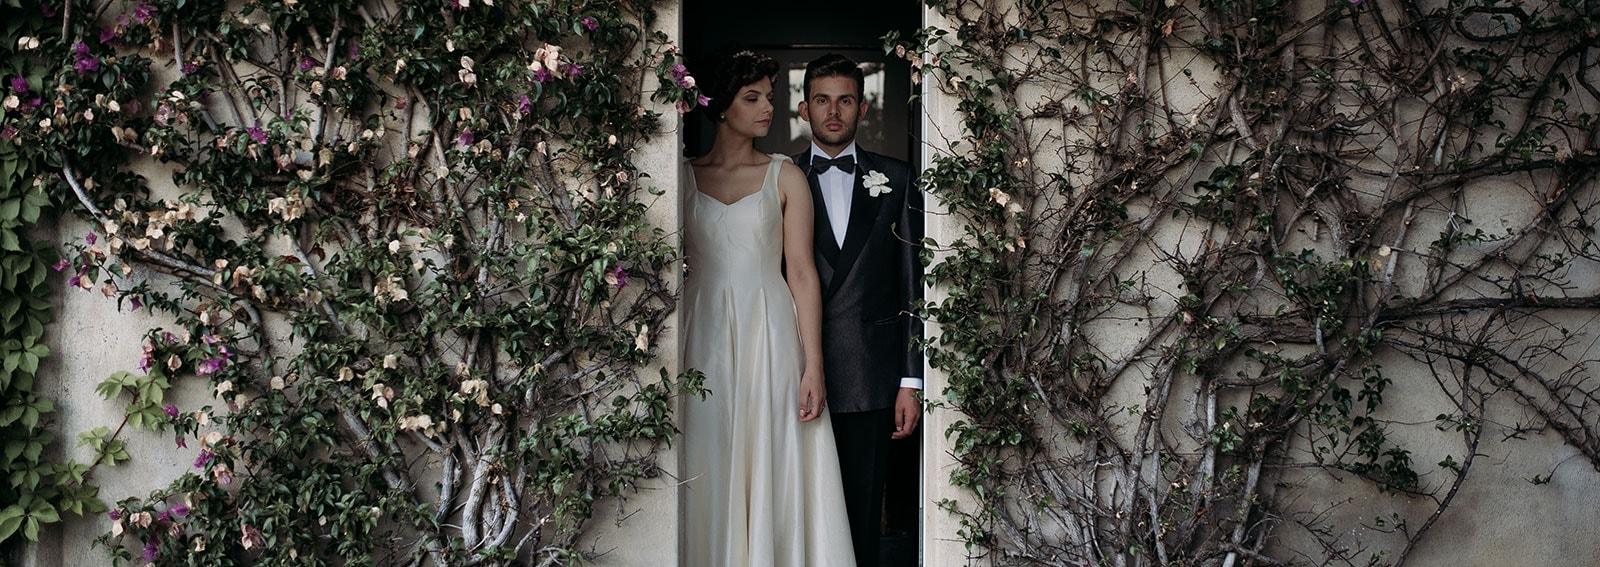 COVER-eleonora-e-gianluca-sposi